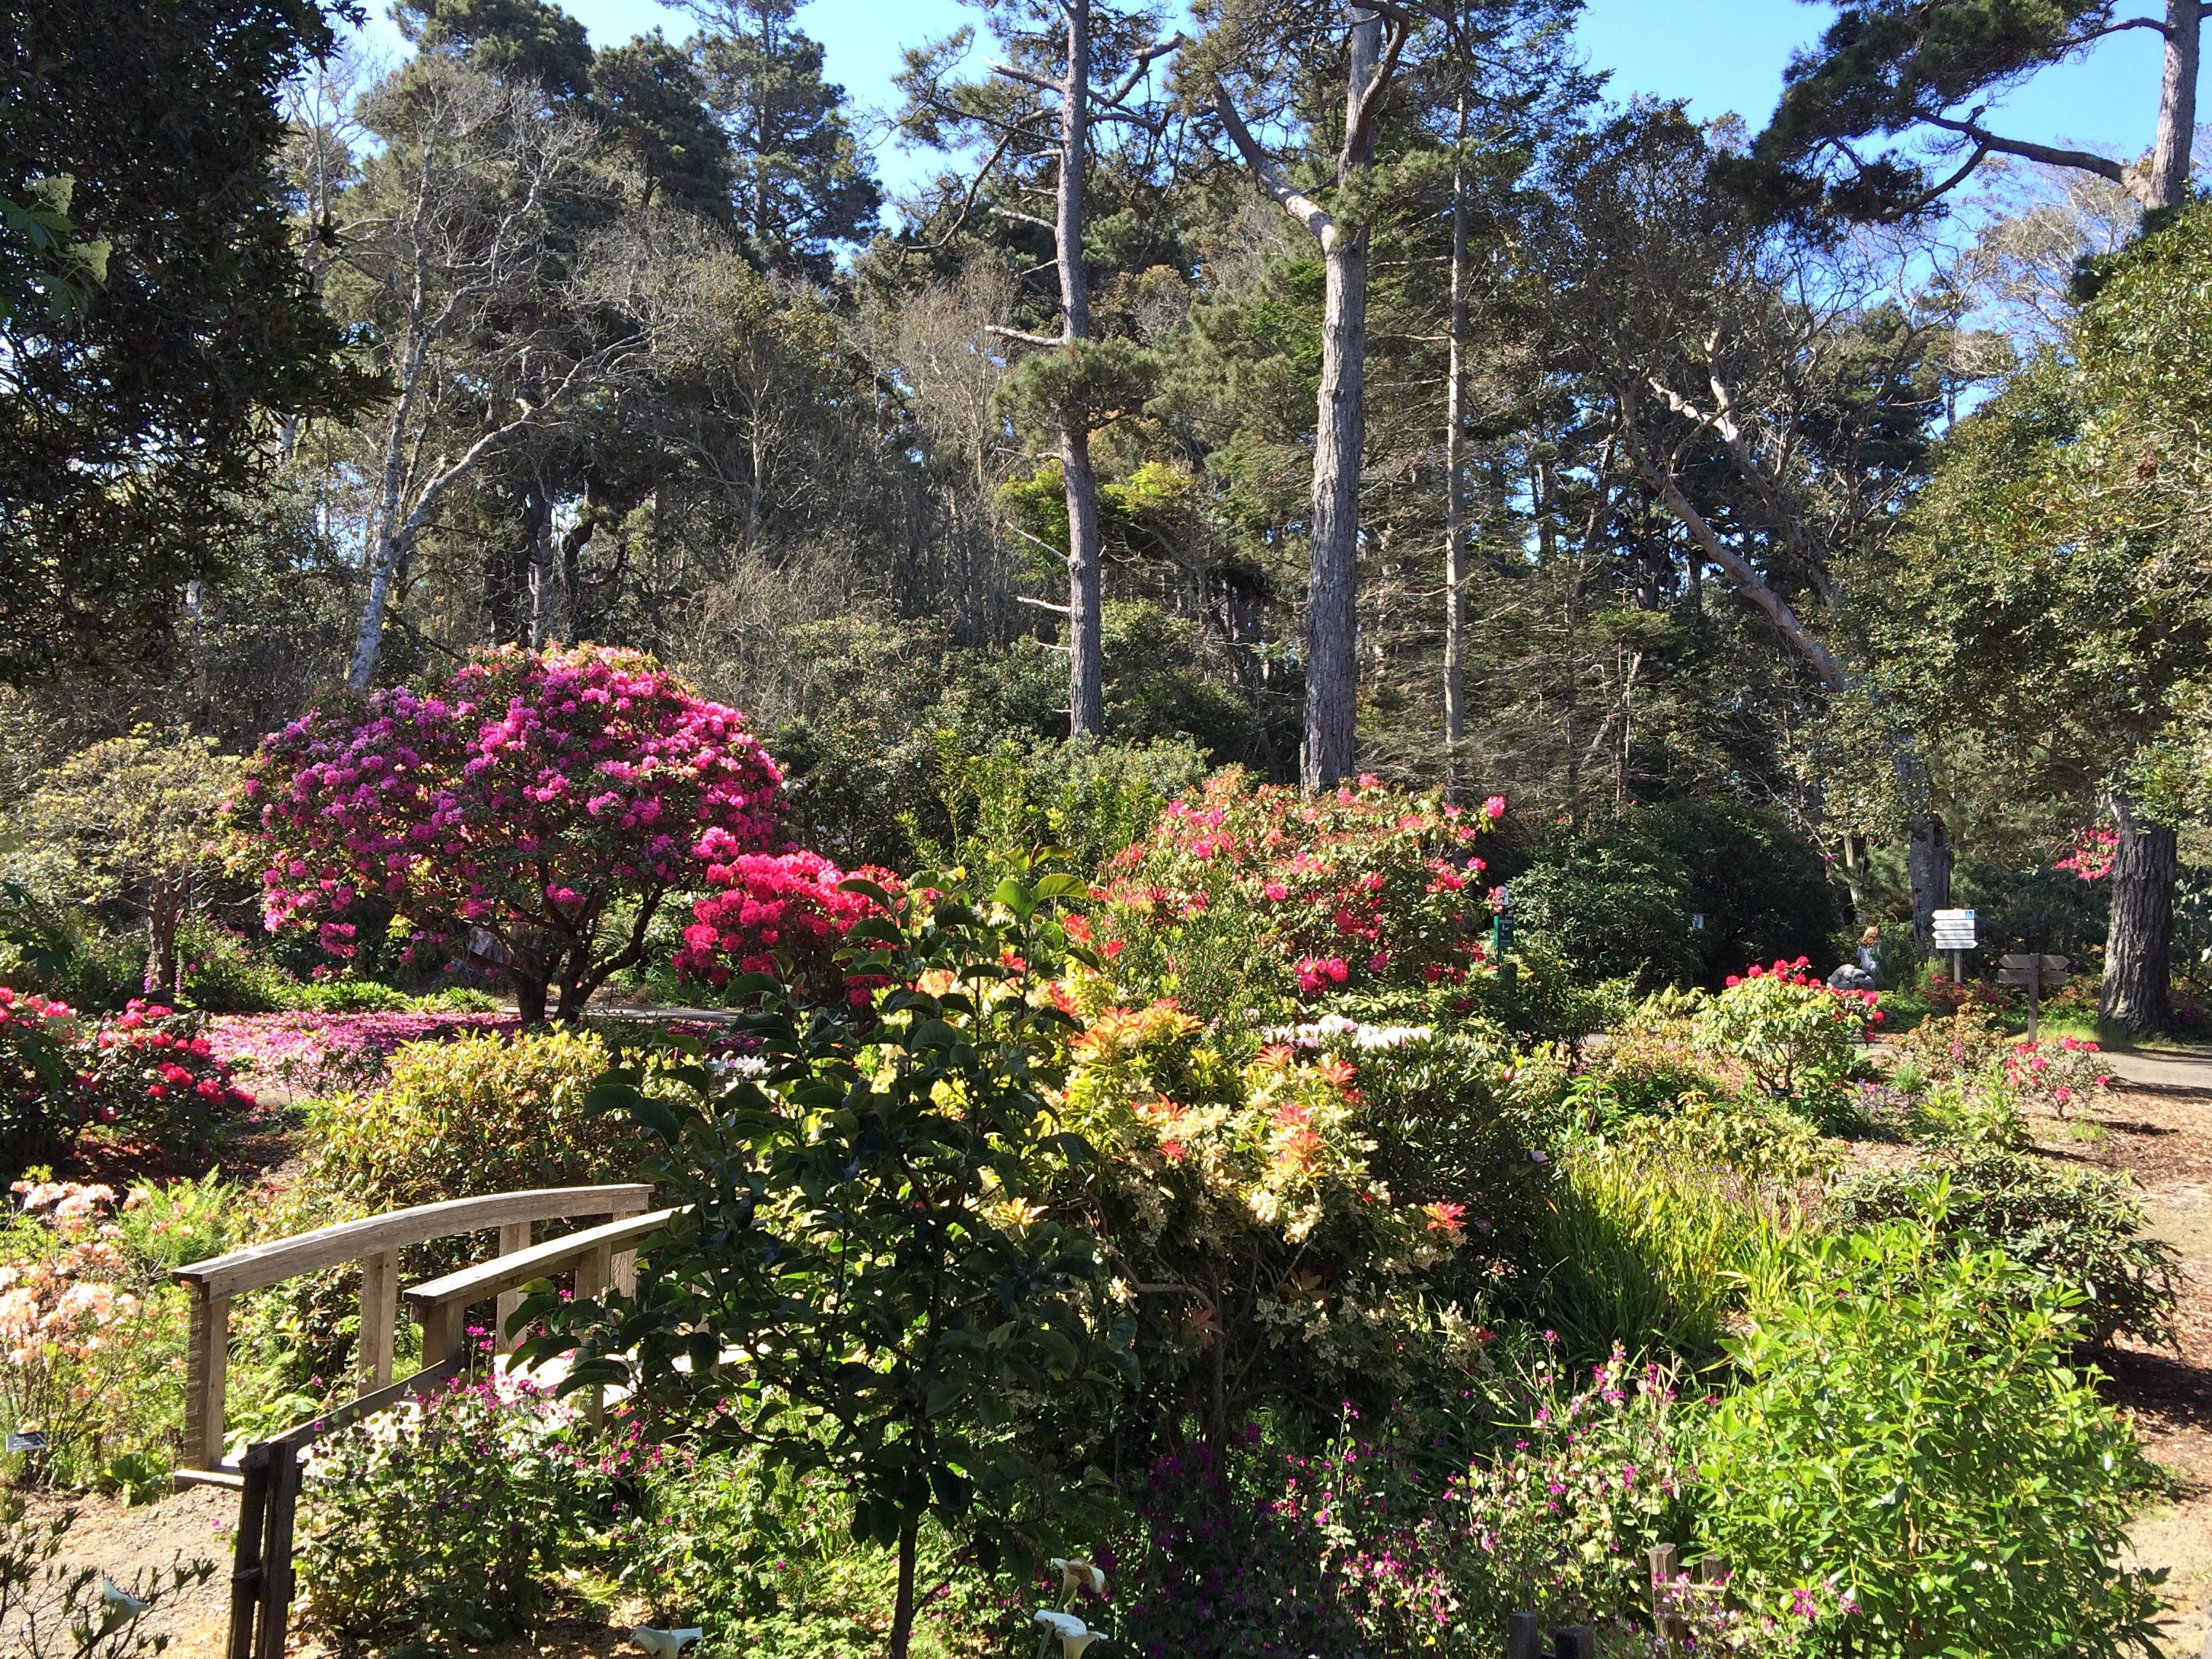 Birding mendocino california brighamstephen - Mendocino coast botanical gardens ...